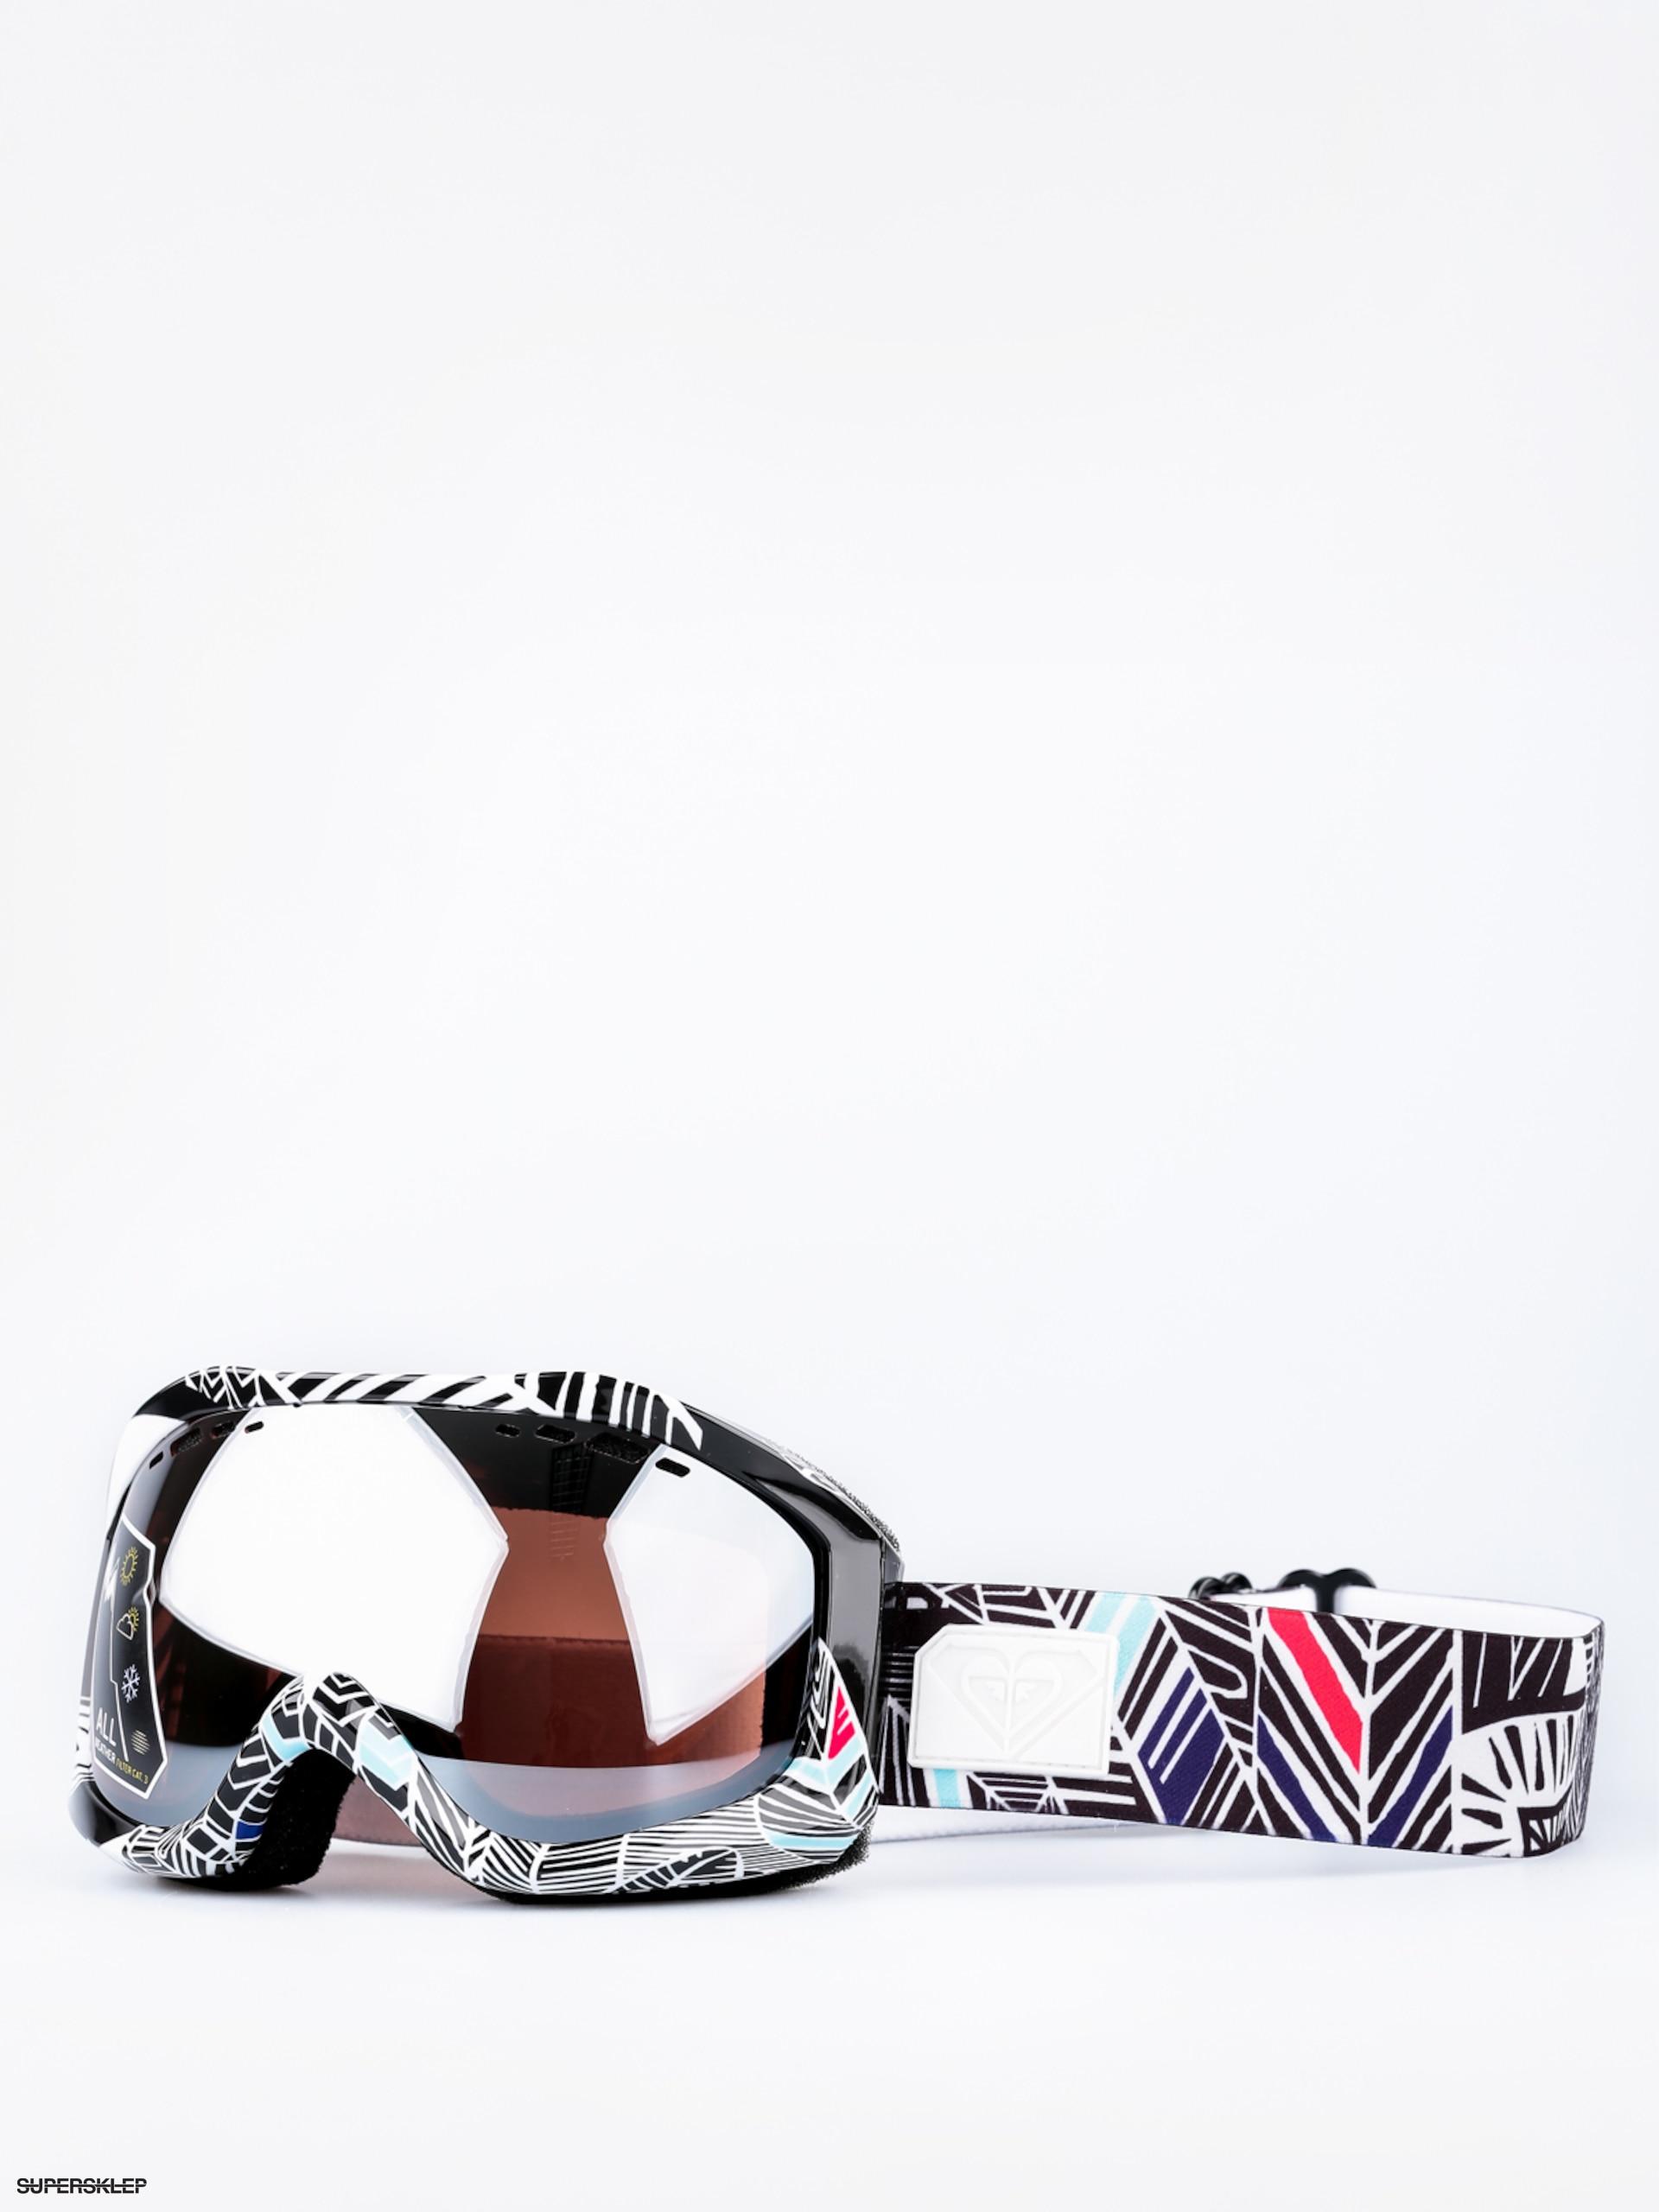 405dc44c4 Okuliare na snowboard Roxy Sunset Art Series Wmn (ha hui true black/amber  rose silver mirror)